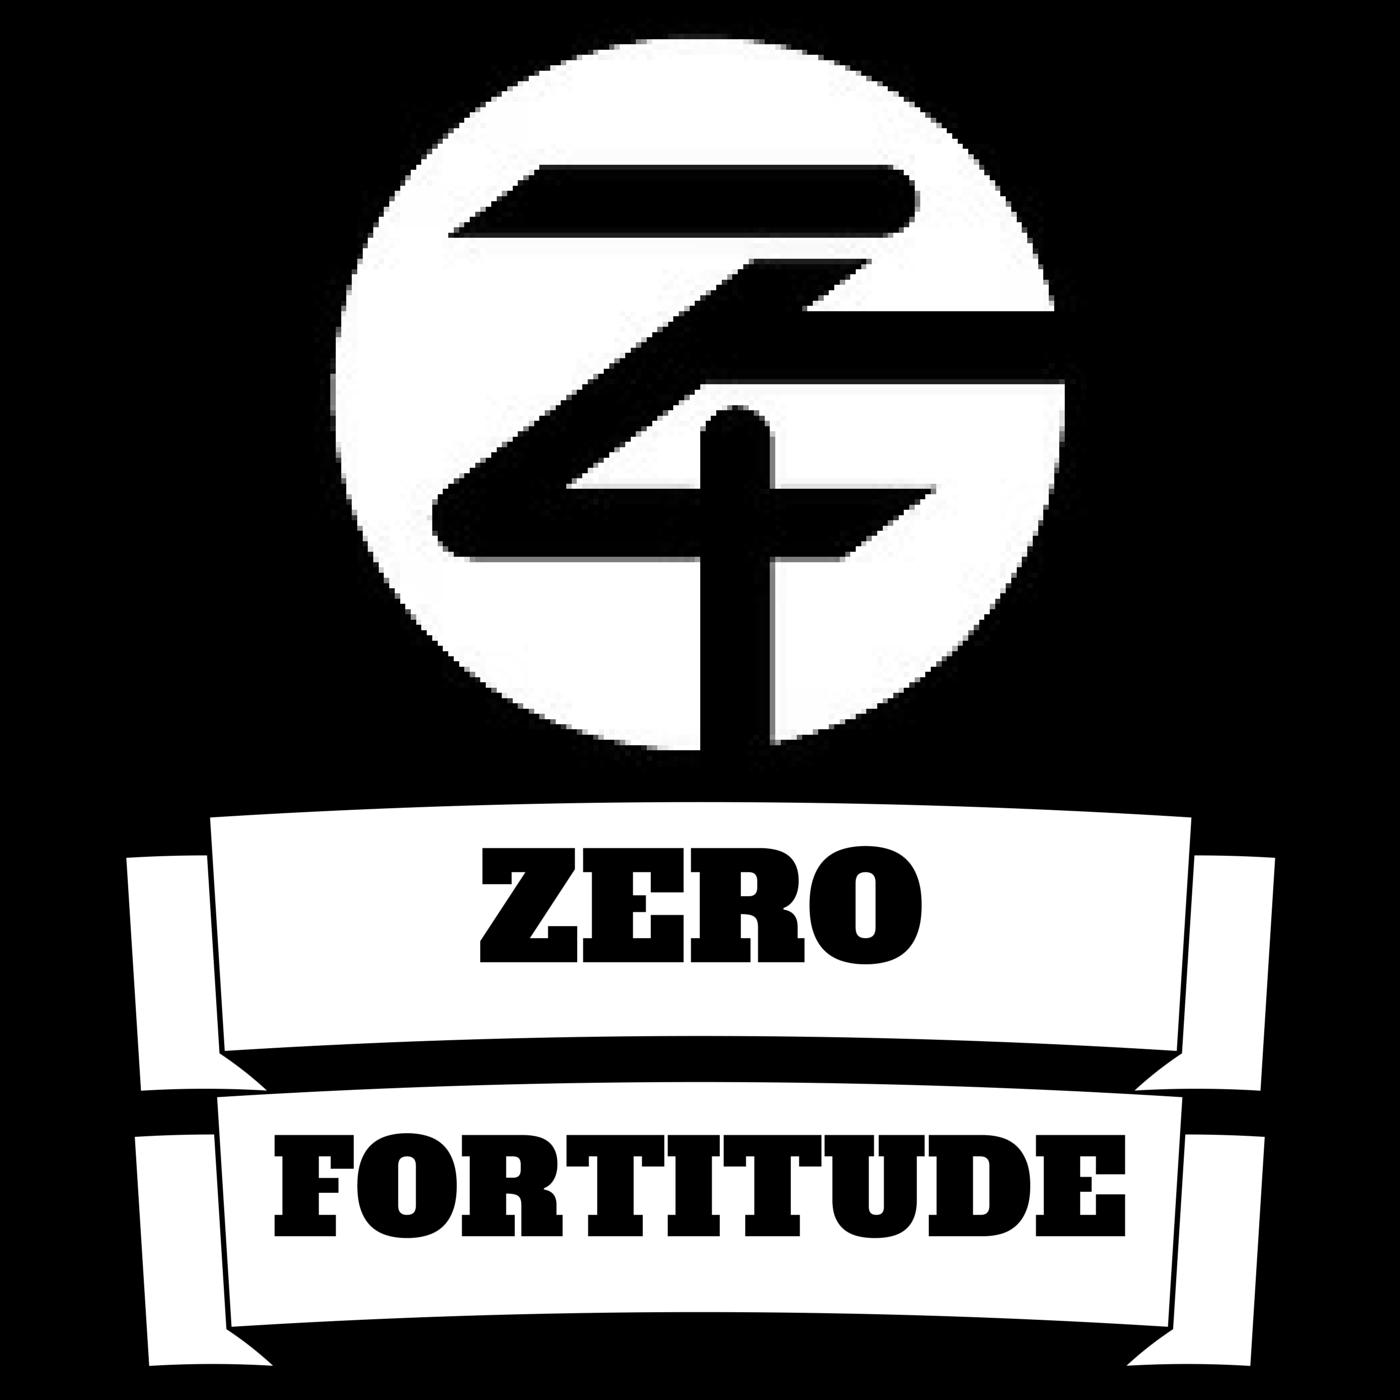 Zero Fortitude